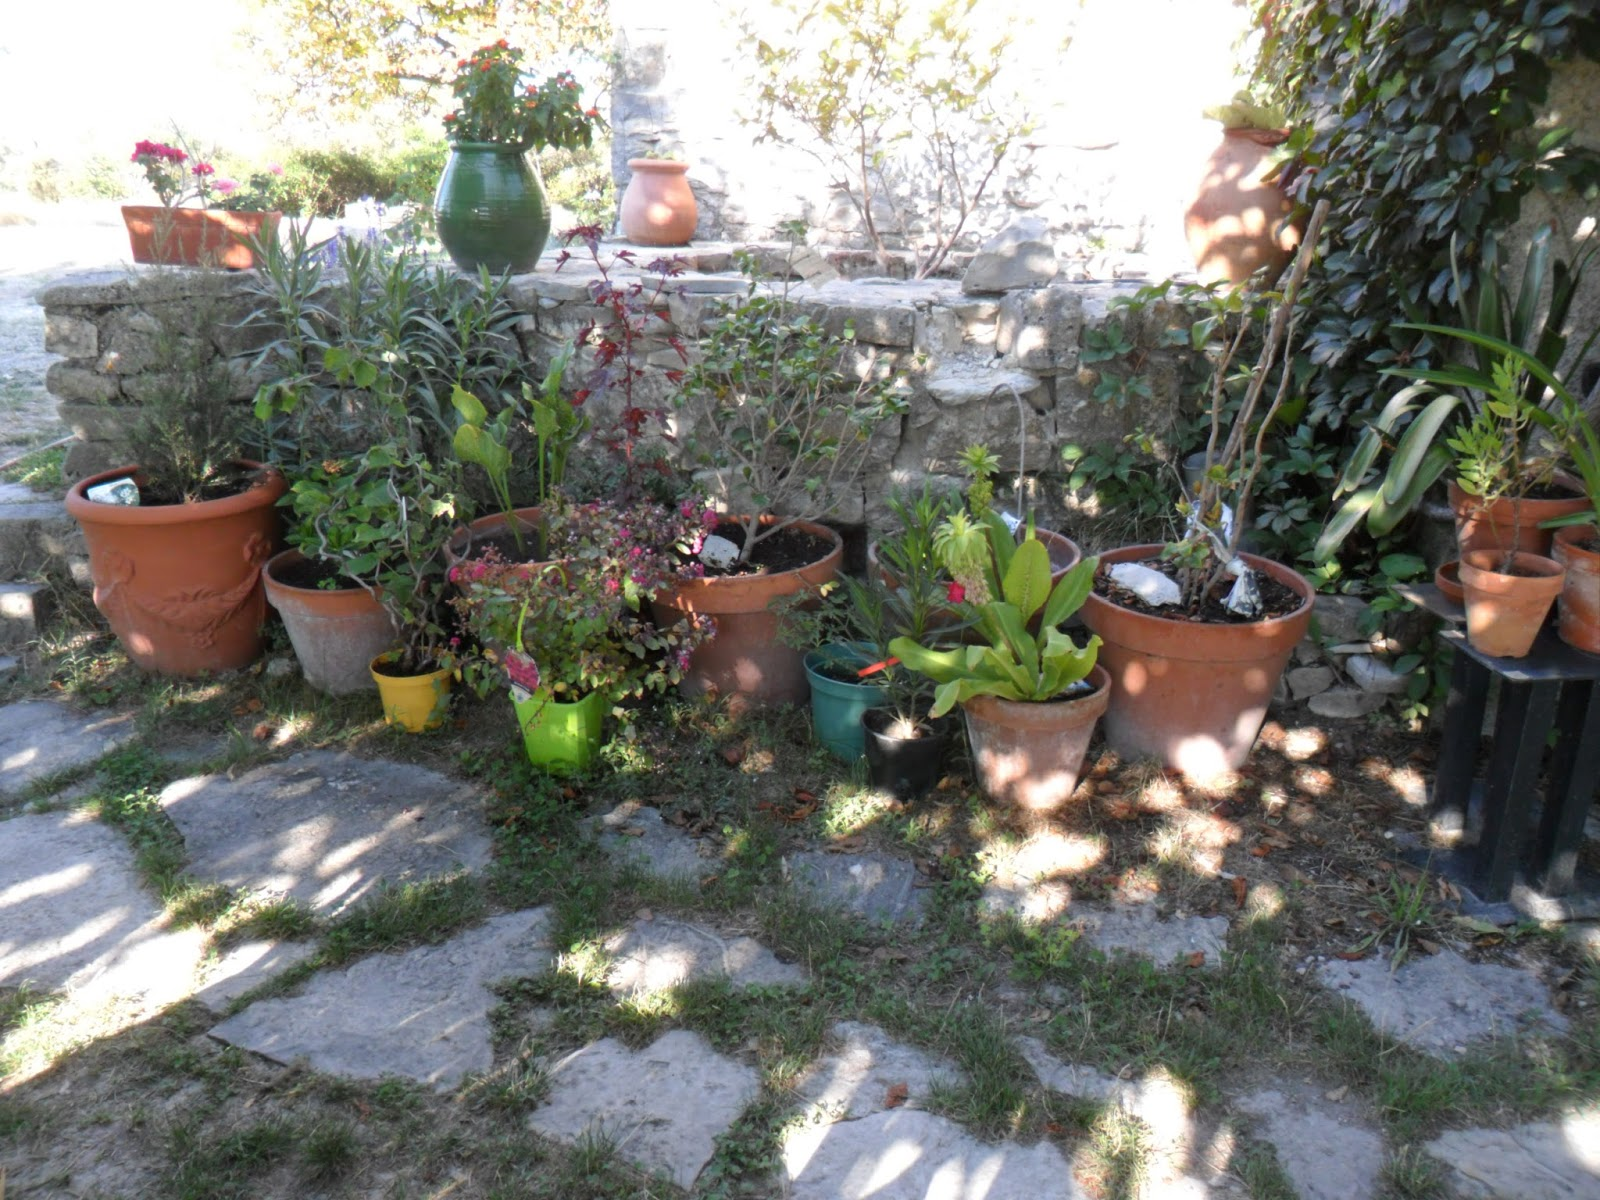 Le jardin de prosper septembre 2015 for Jardin septembre 2015